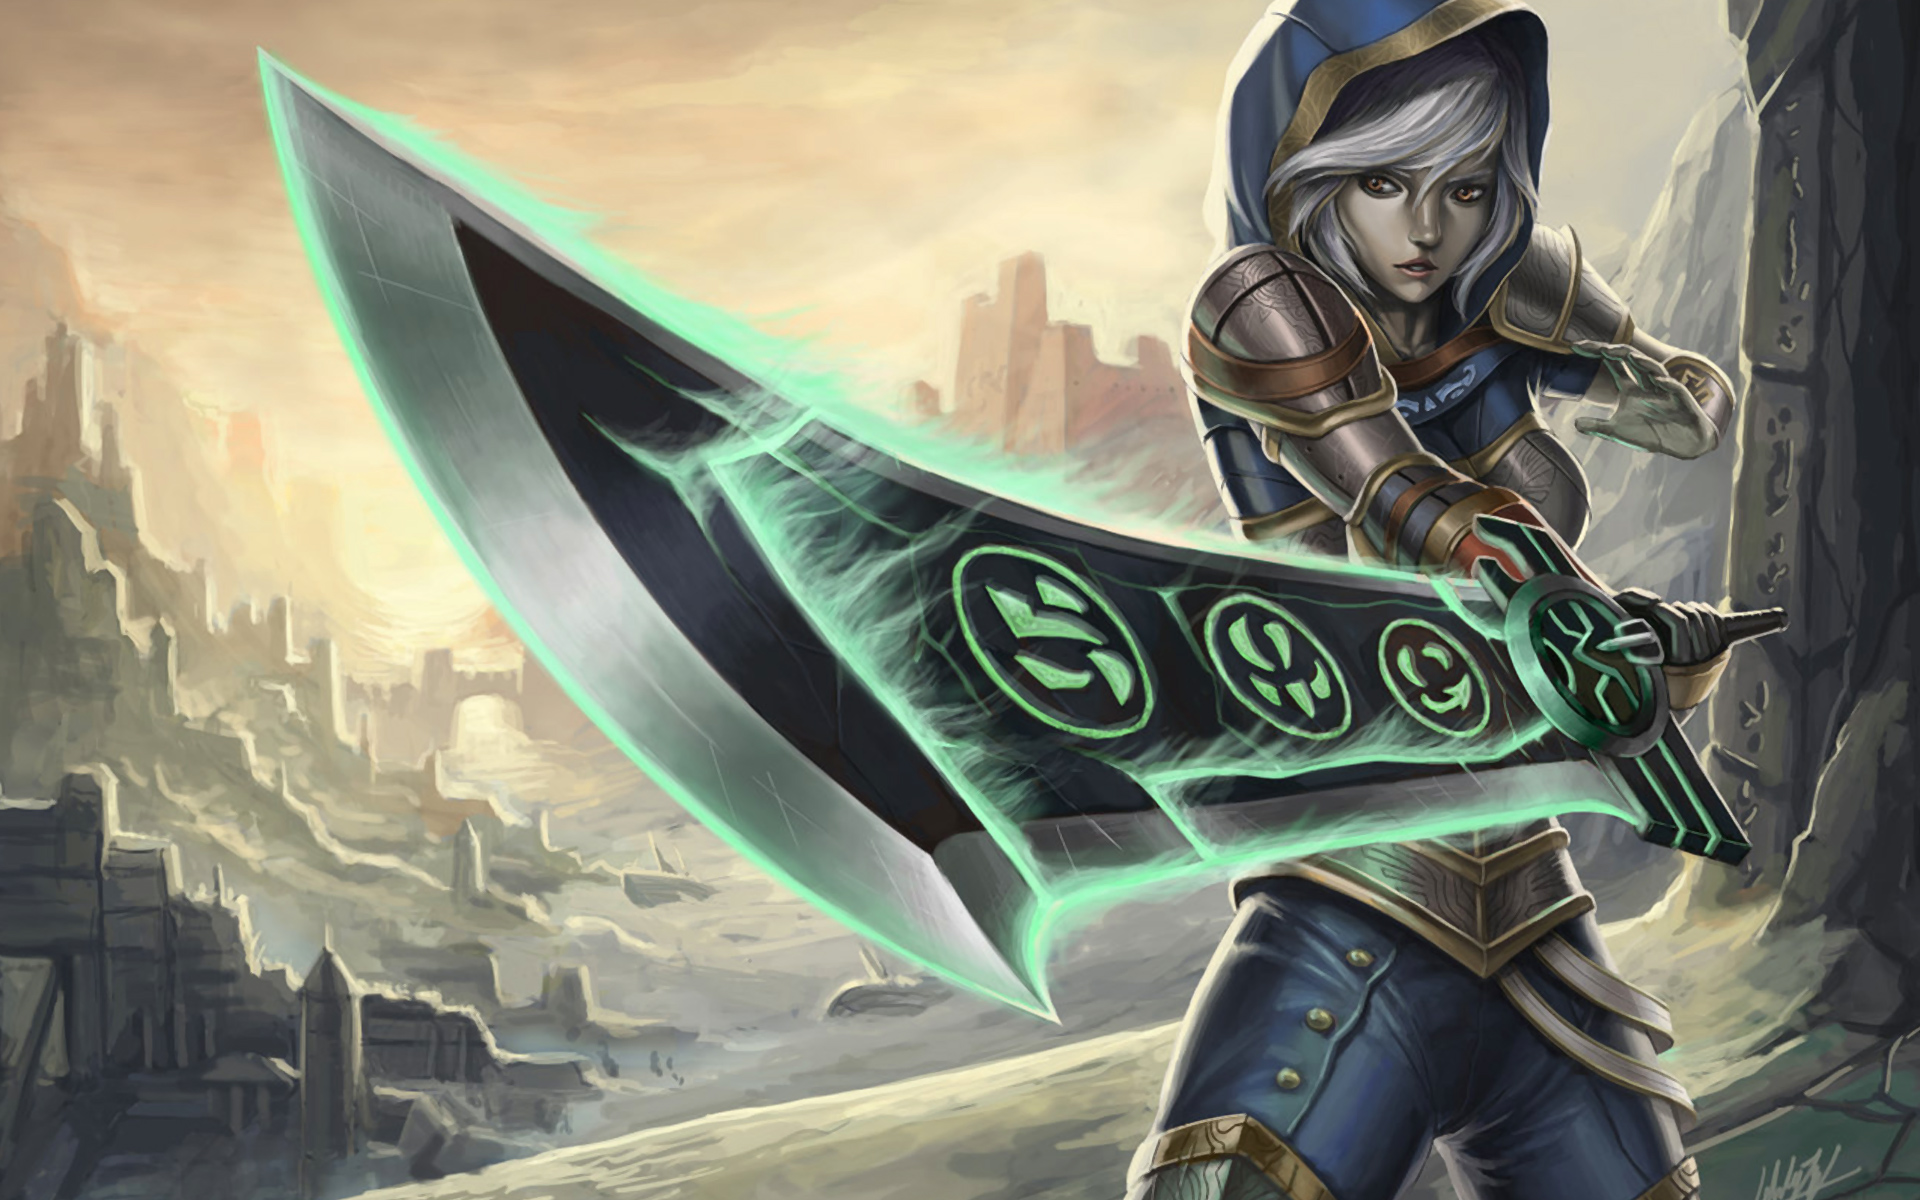 Free Download League Of Legends Wallpaper Riven Hd Girl Hd